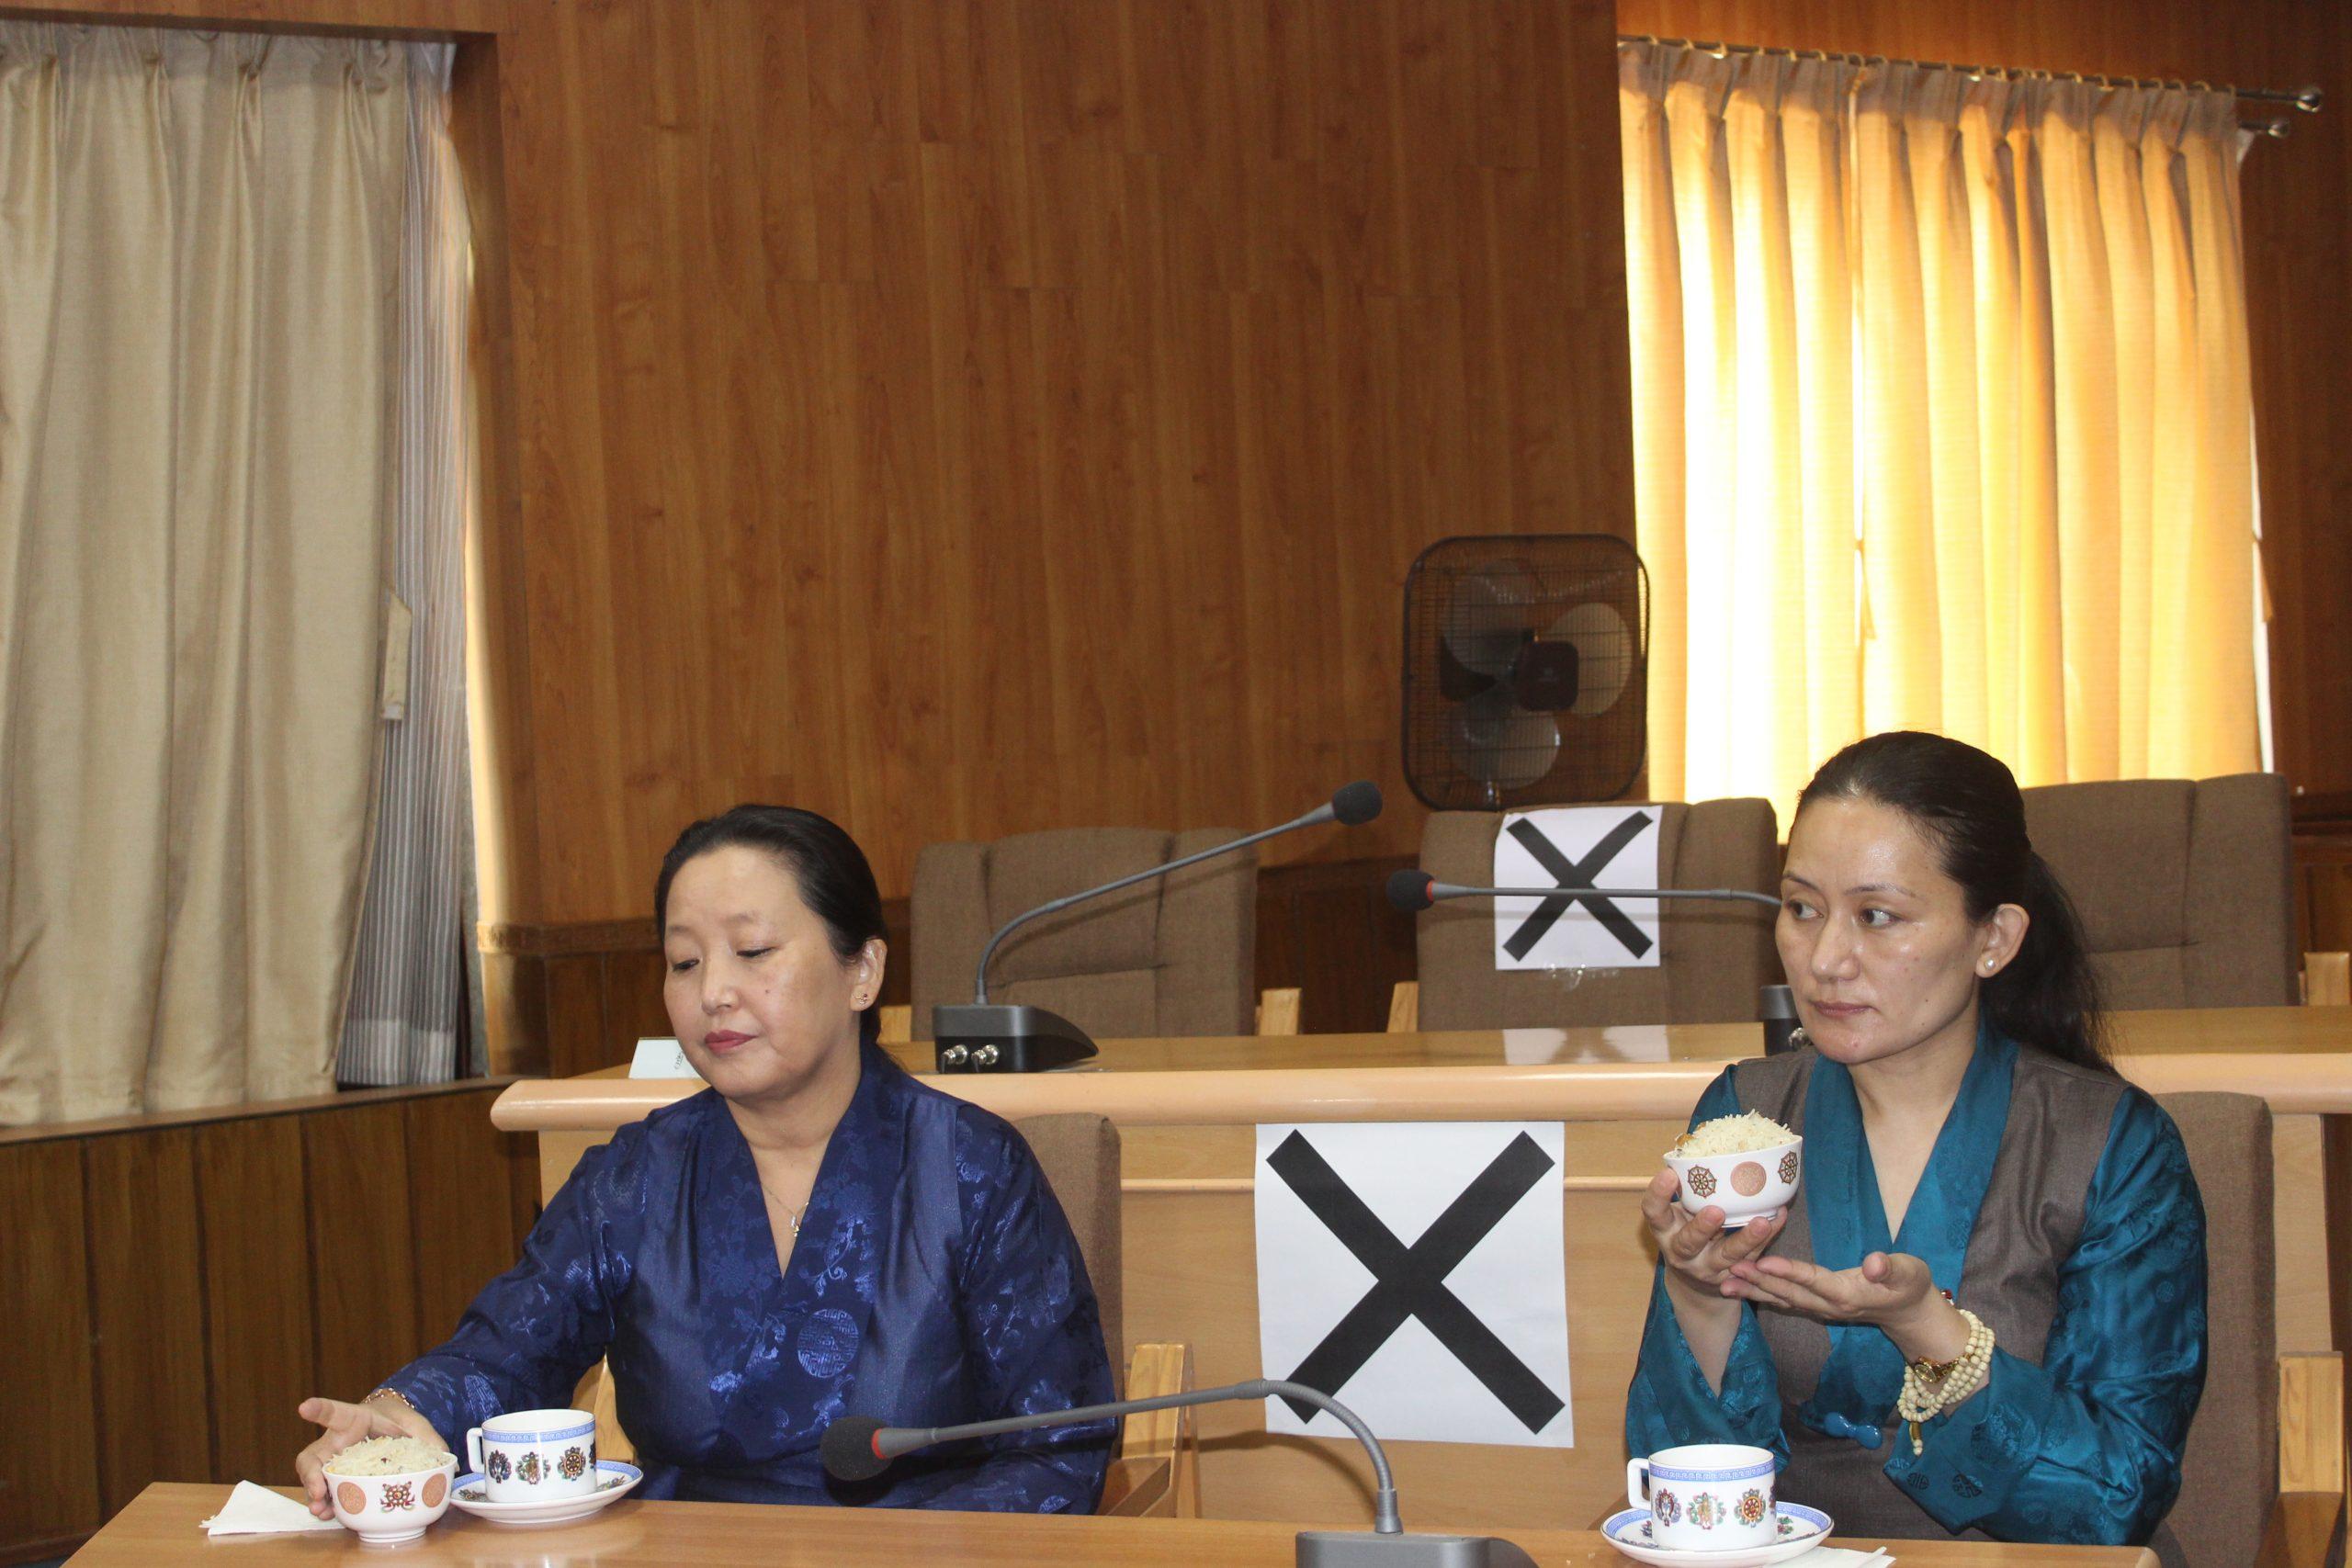 Parliamentarians Tsering Dolma and Sonam Wangmo Sworn in